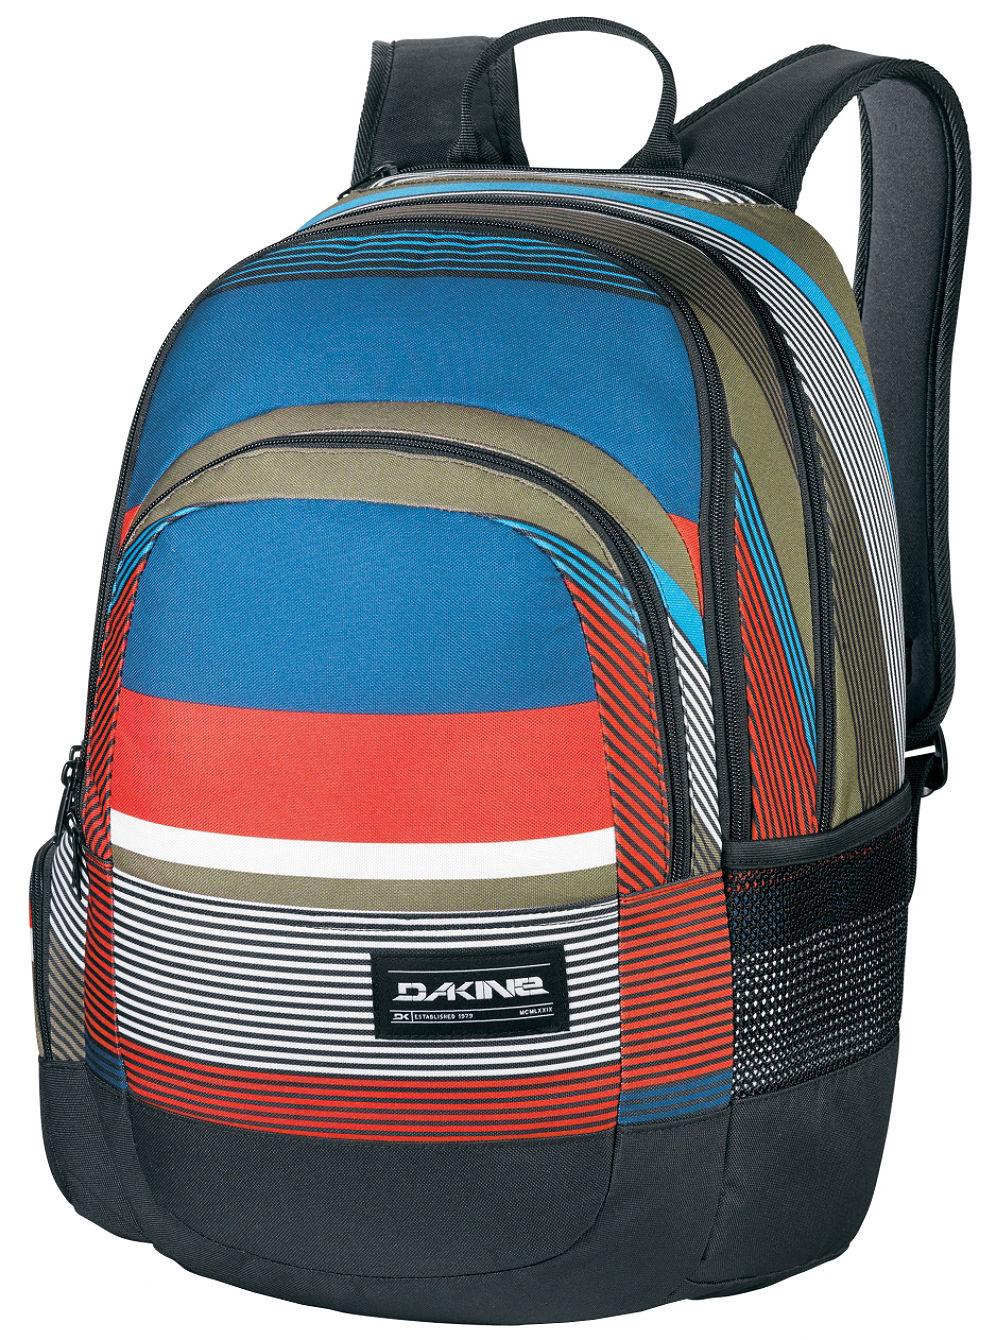 portal-32l-backpack